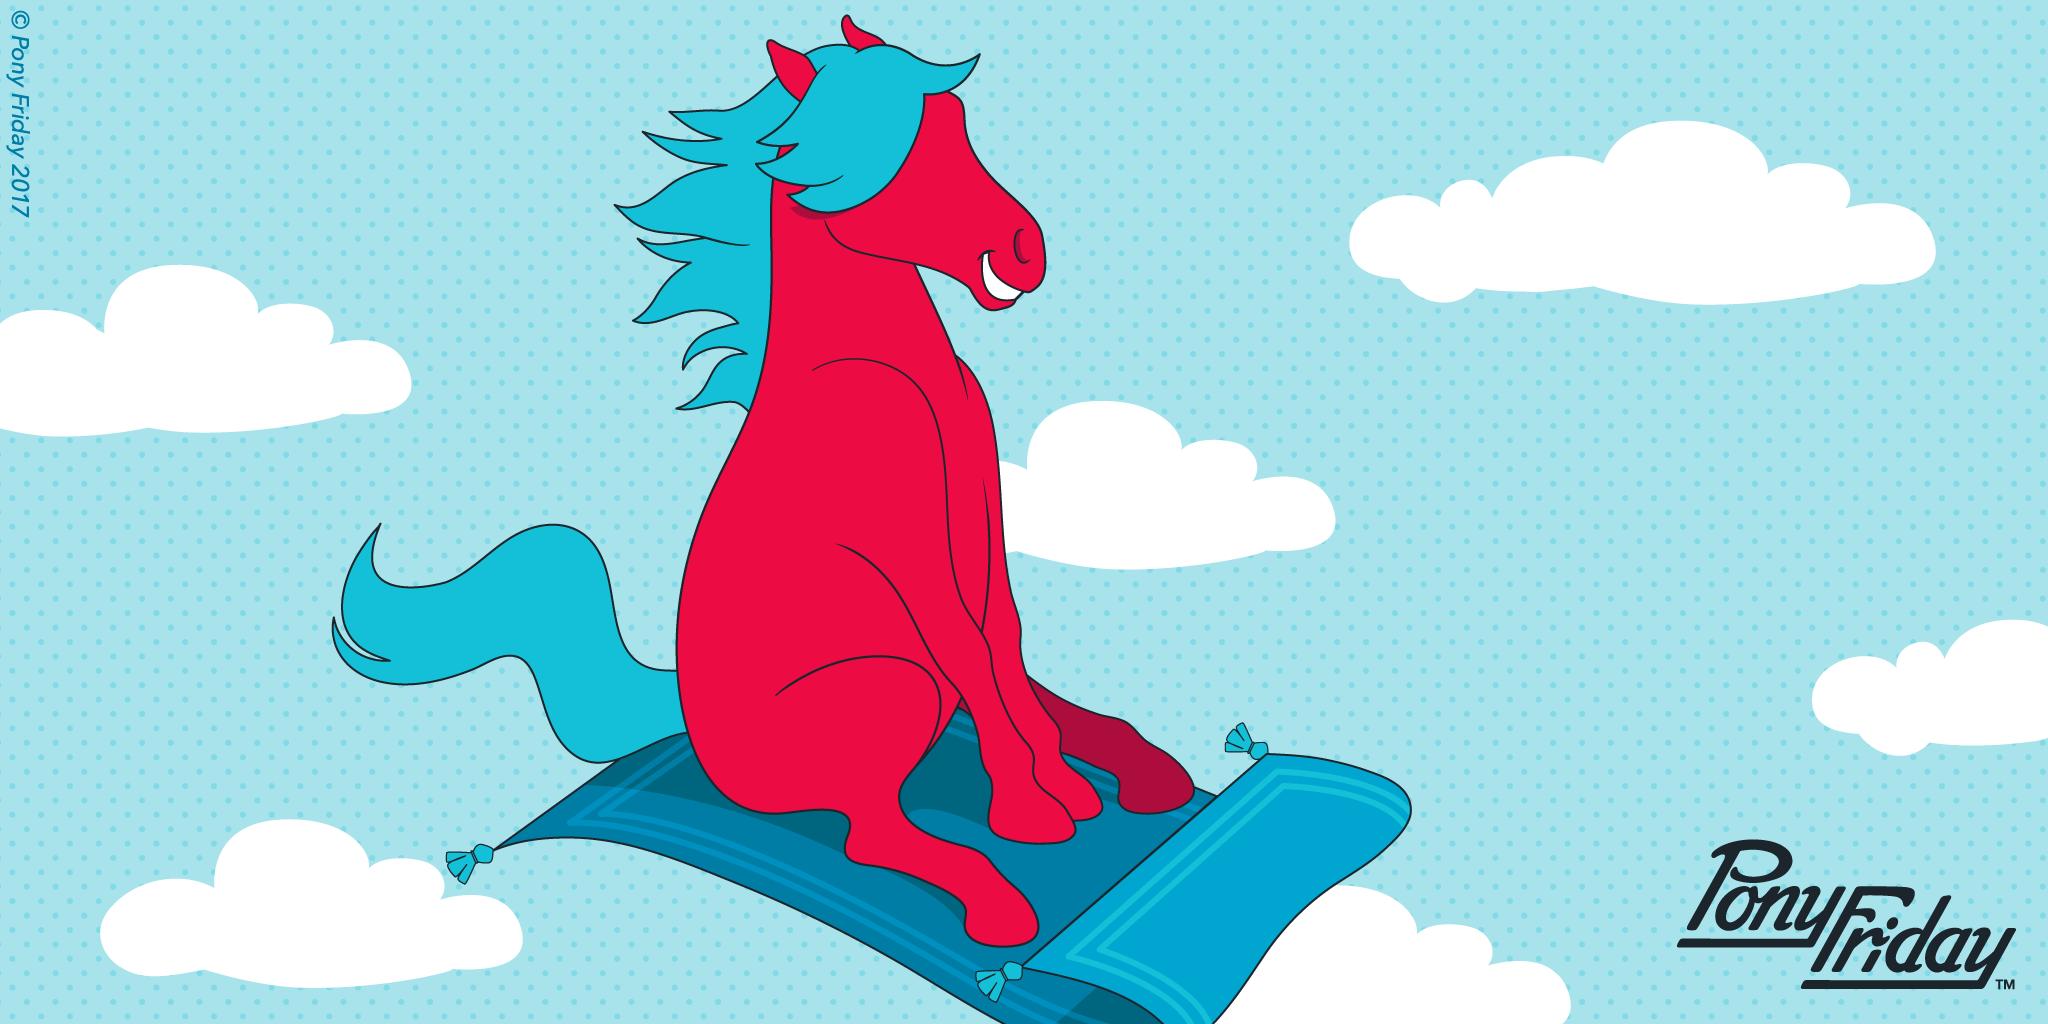 Pony-Friday-Magic-Carpet-Carpe-Diem-Flying-Clouds-Sky-Summer-Air-Blog-Header-Image.png